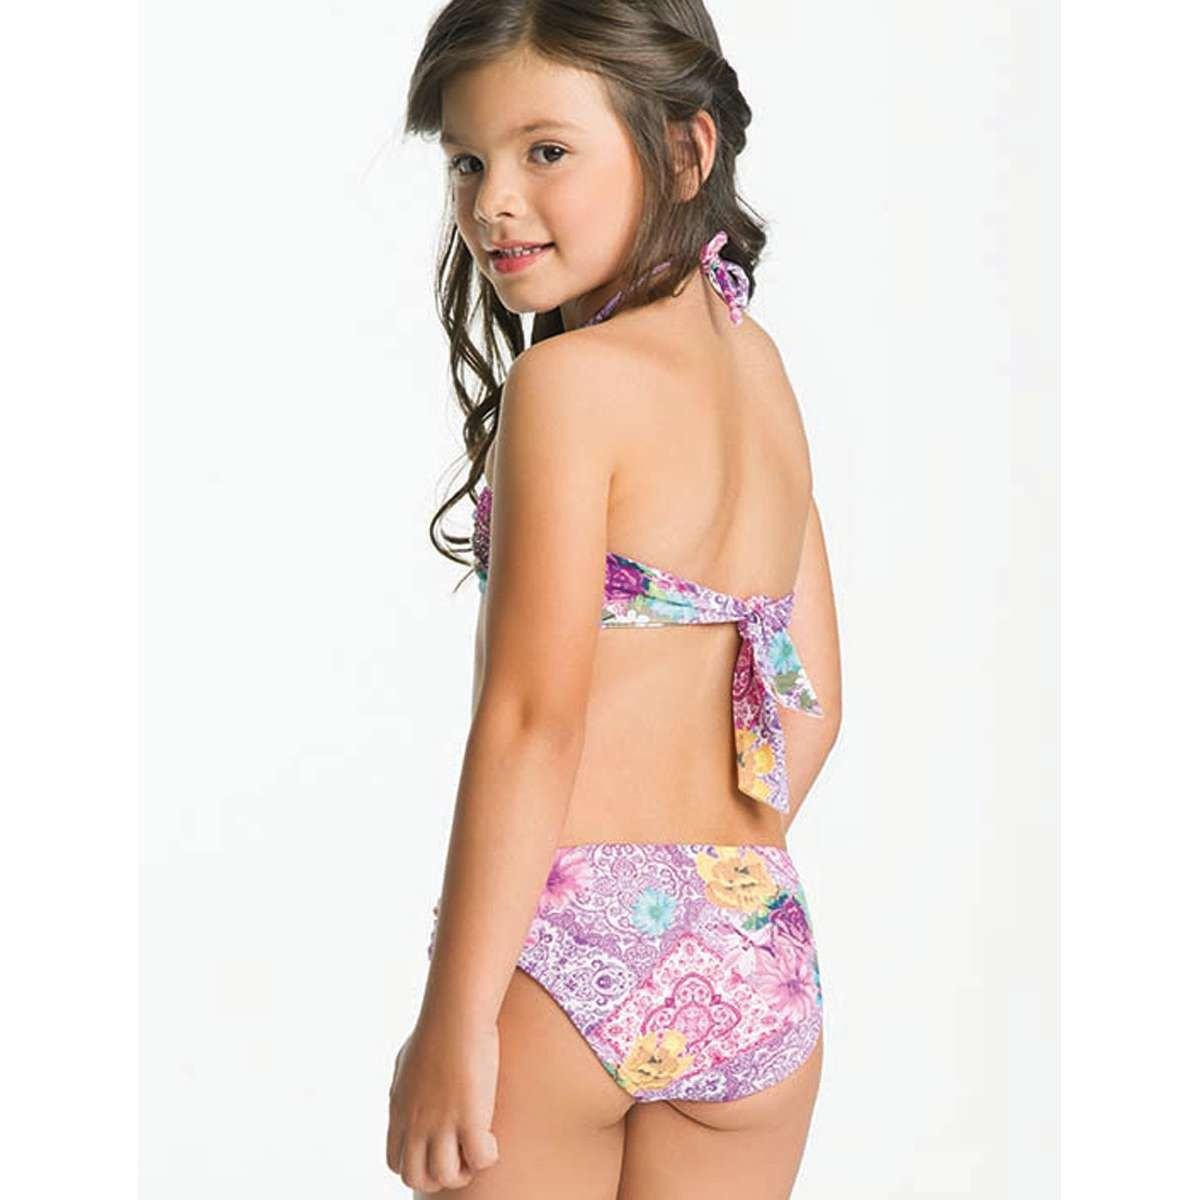 Backs of girls in bikinis